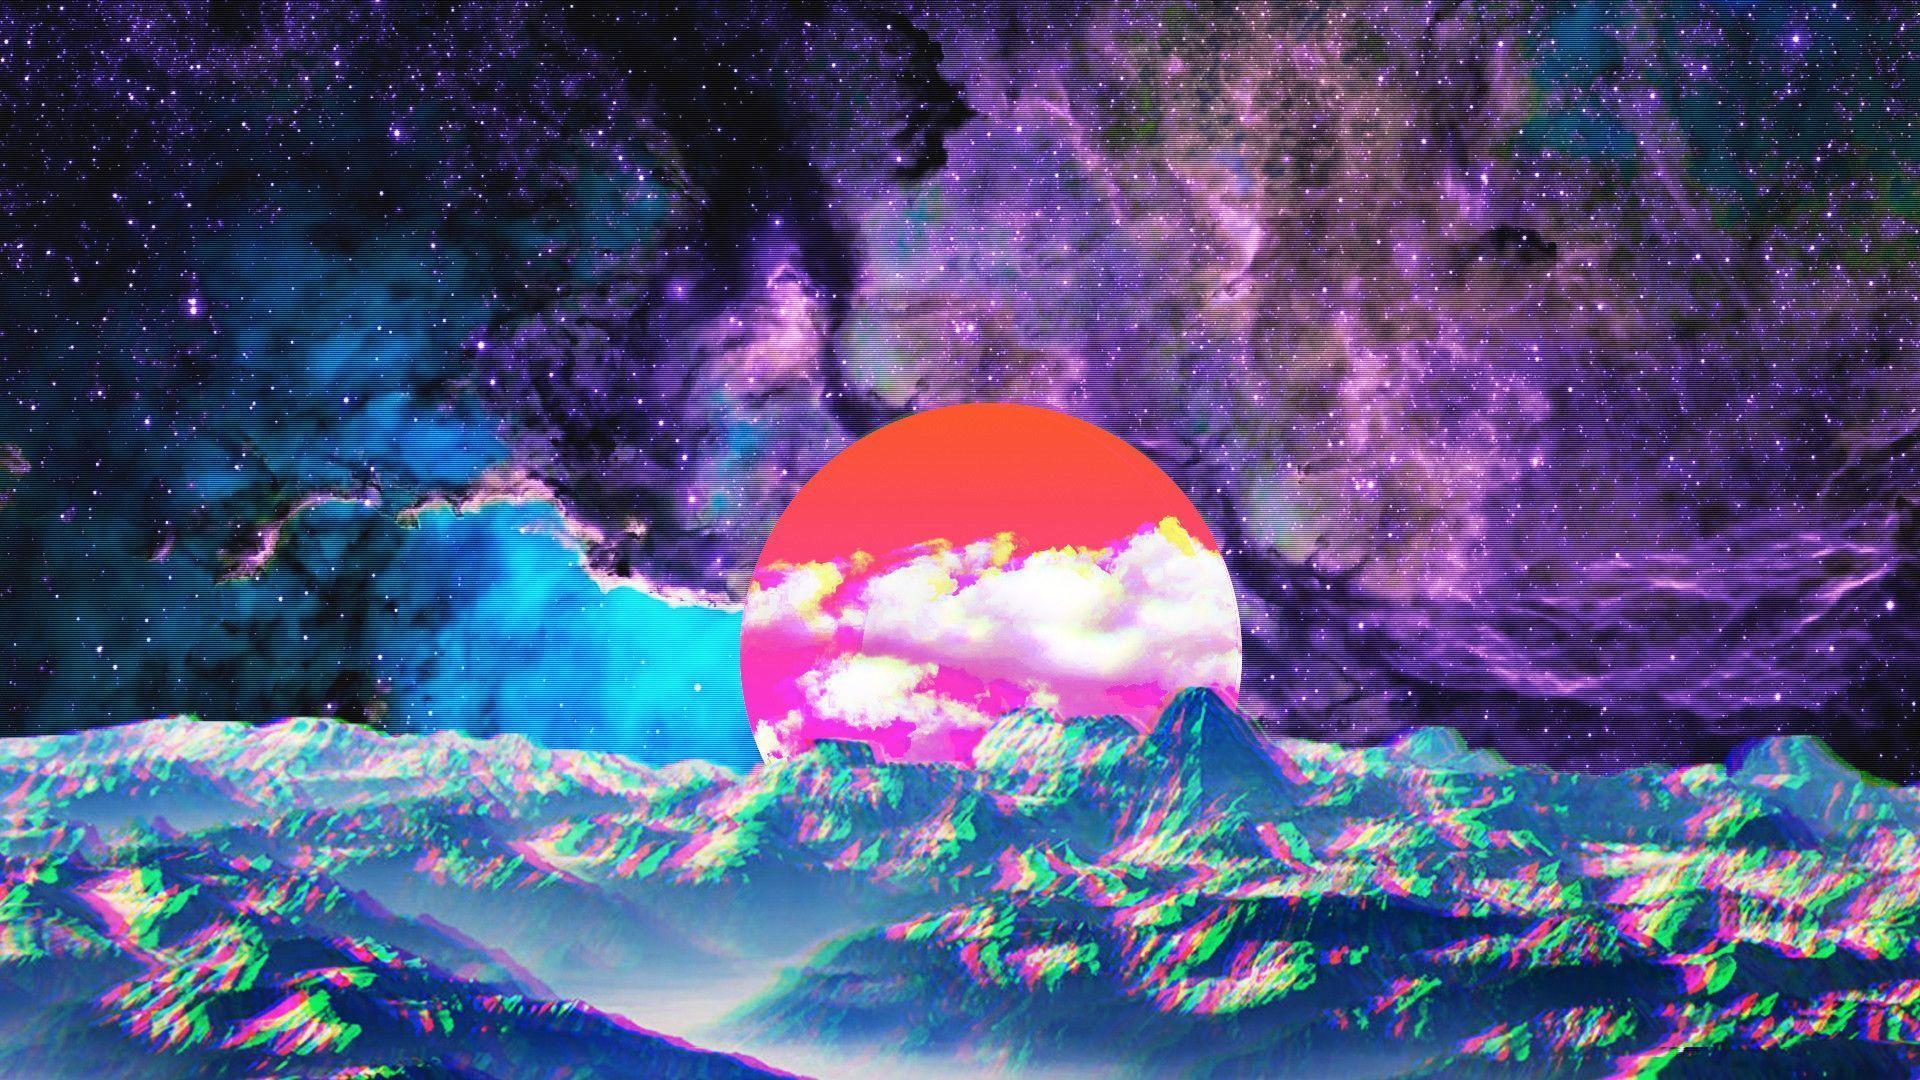 Japanese Aesthetic Desktop Wallpapers on WallpaperDog